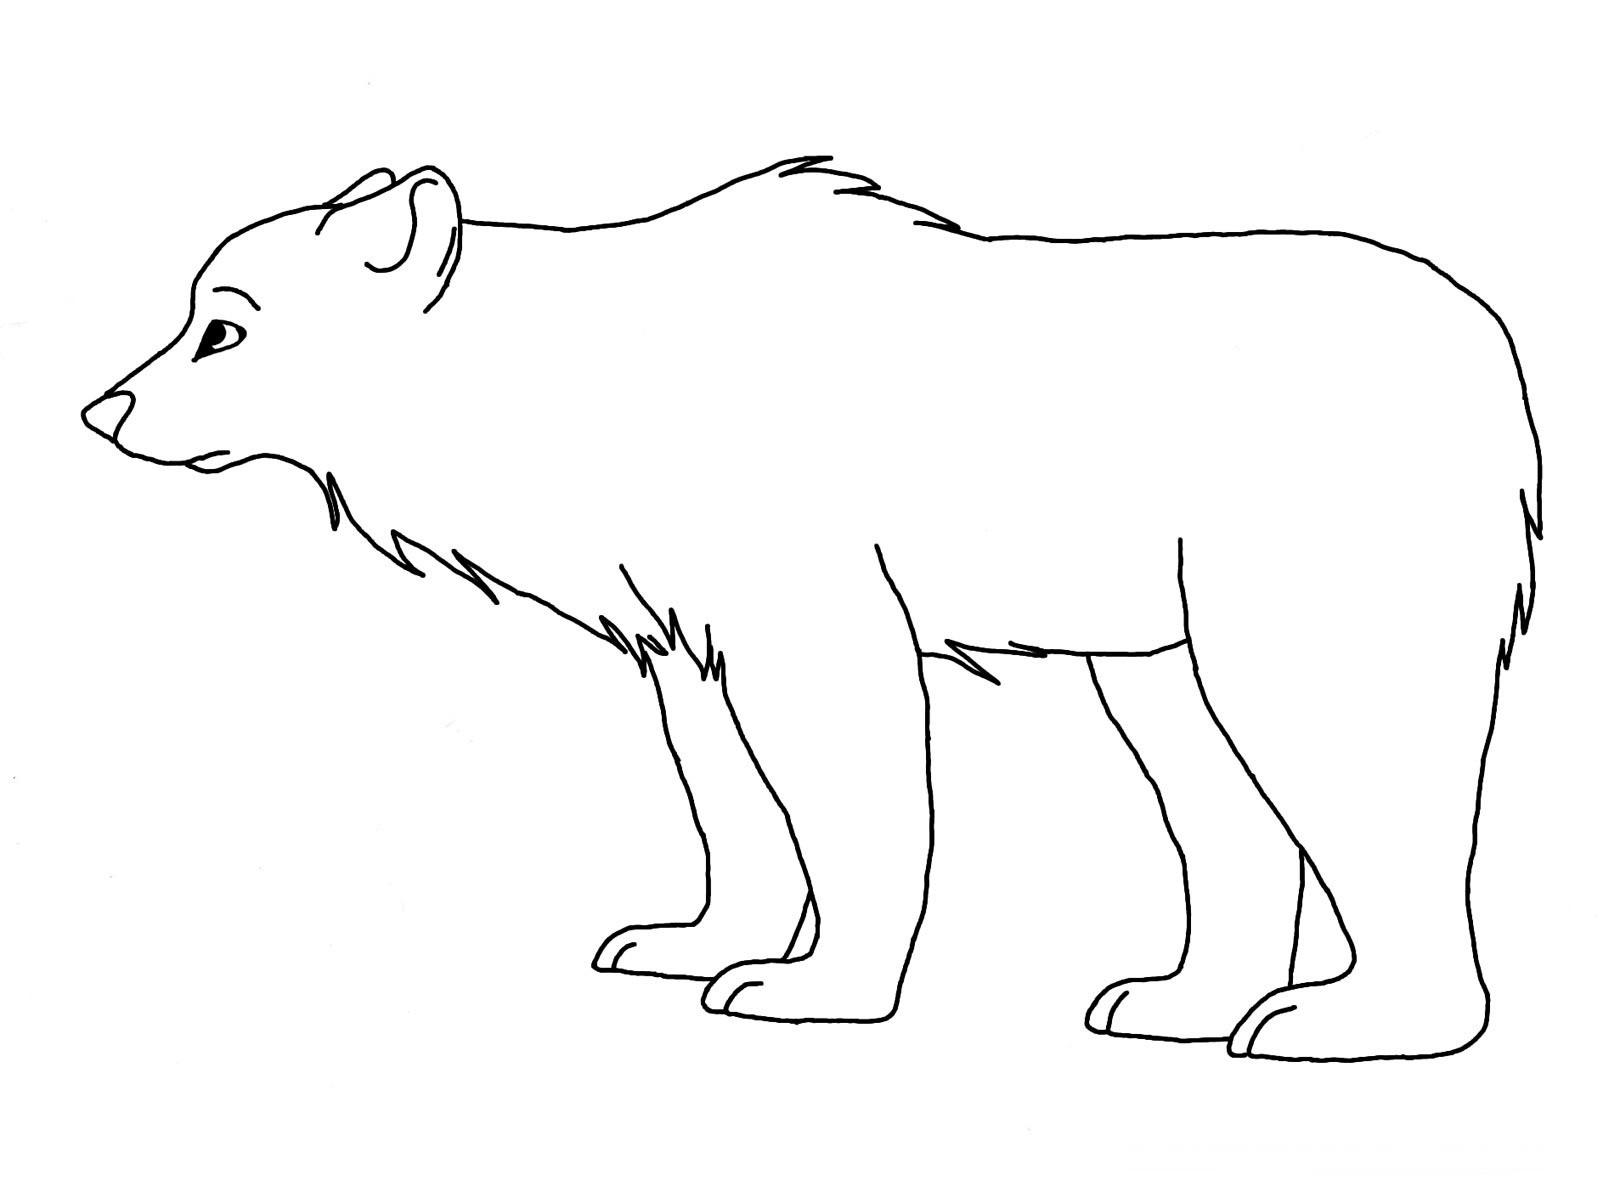 Polar Bear Coloring Sheet  Free Printable Polar Bear Coloring Pages For Kids